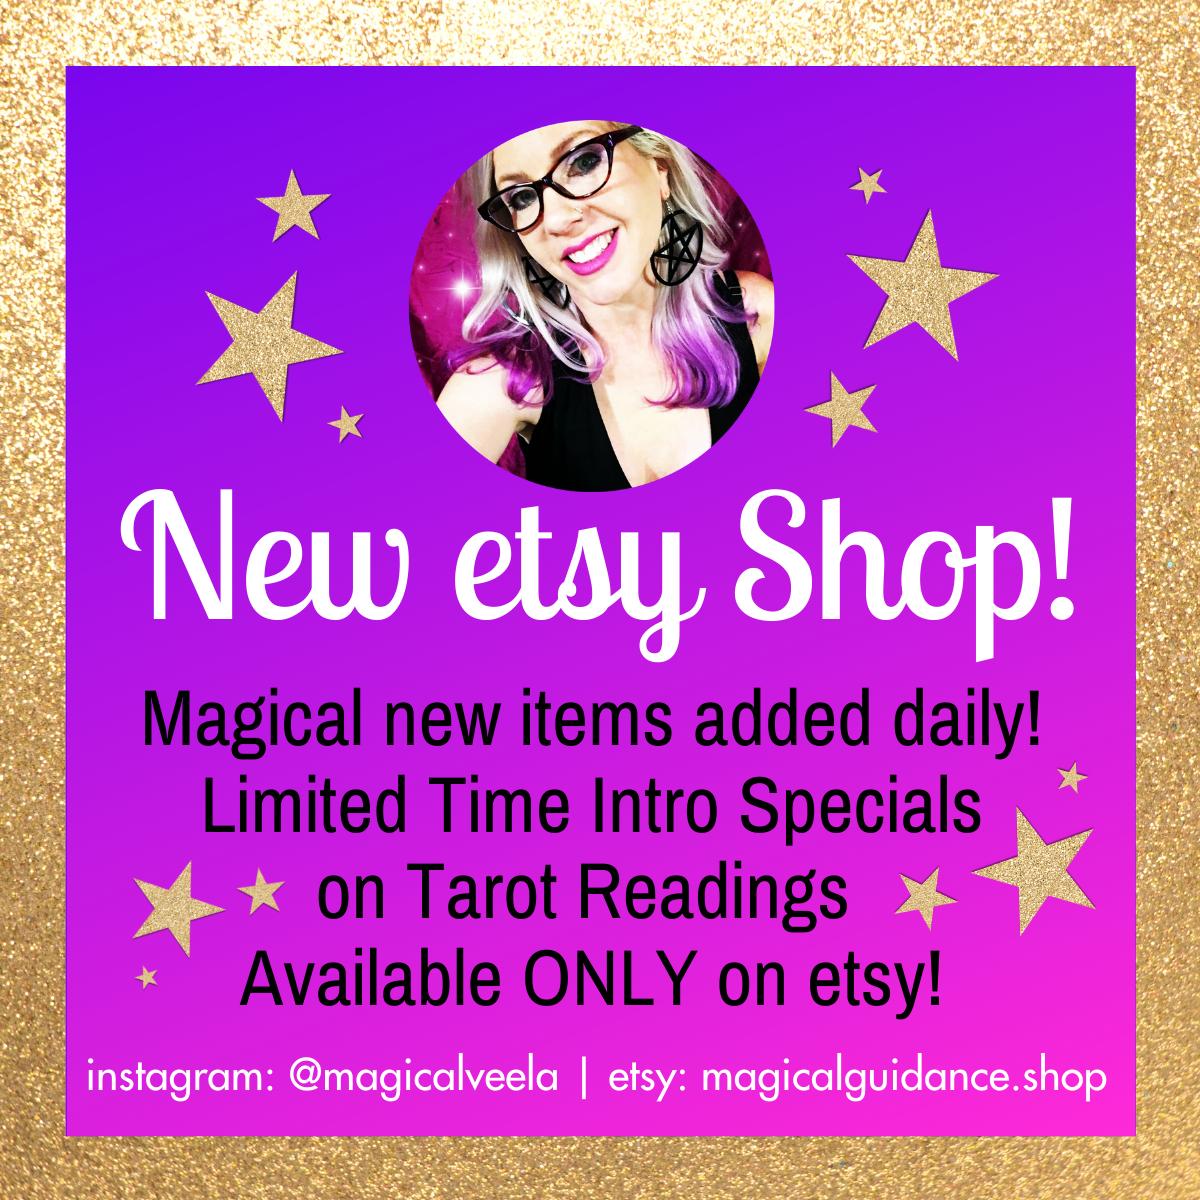 new etsy shop @ magicalguidance.shop